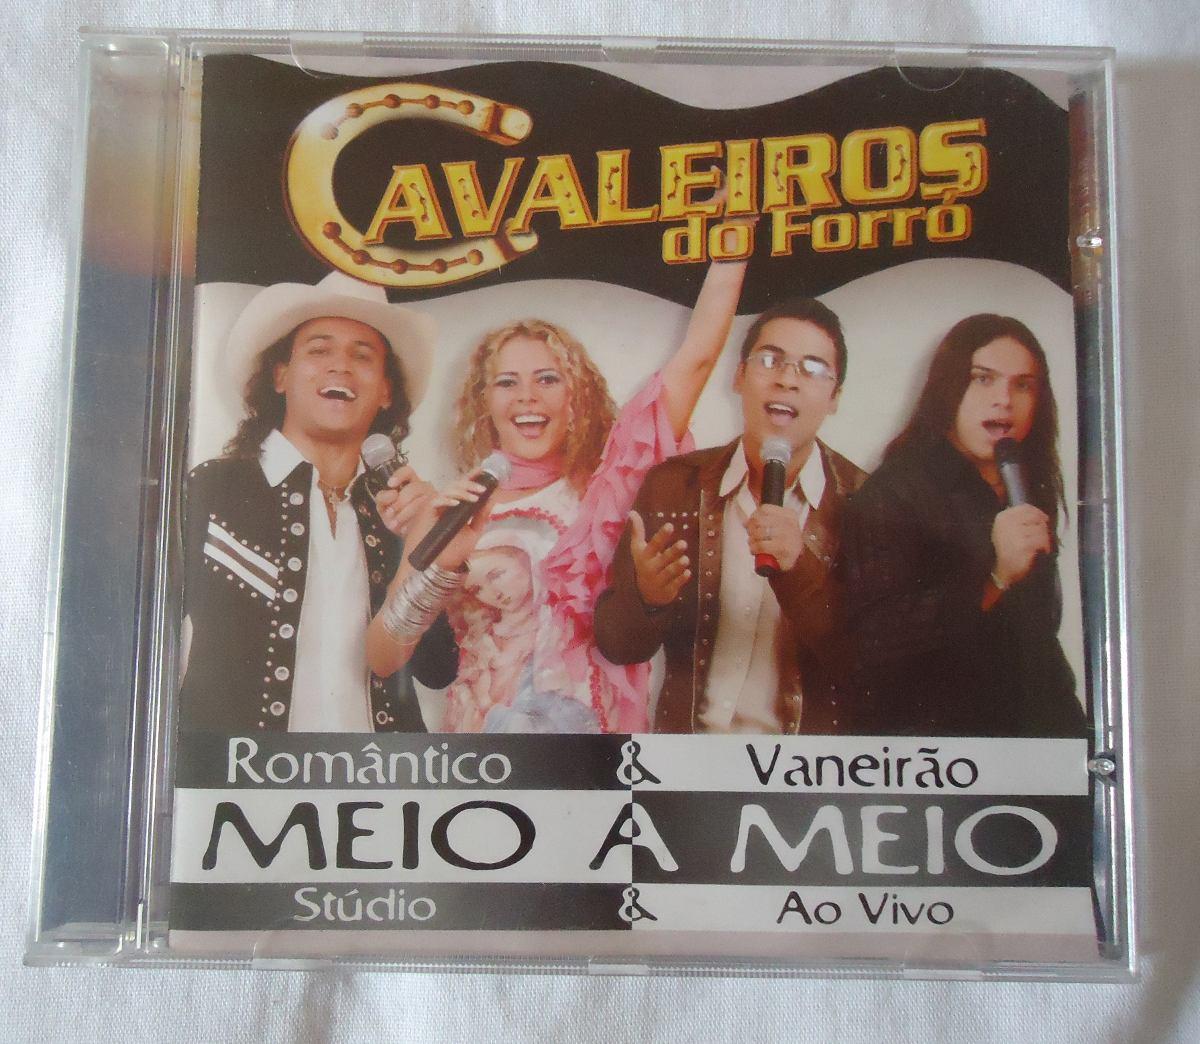 BAIXAR DO VOLUME CD 4 FORRO CAVALEIROS